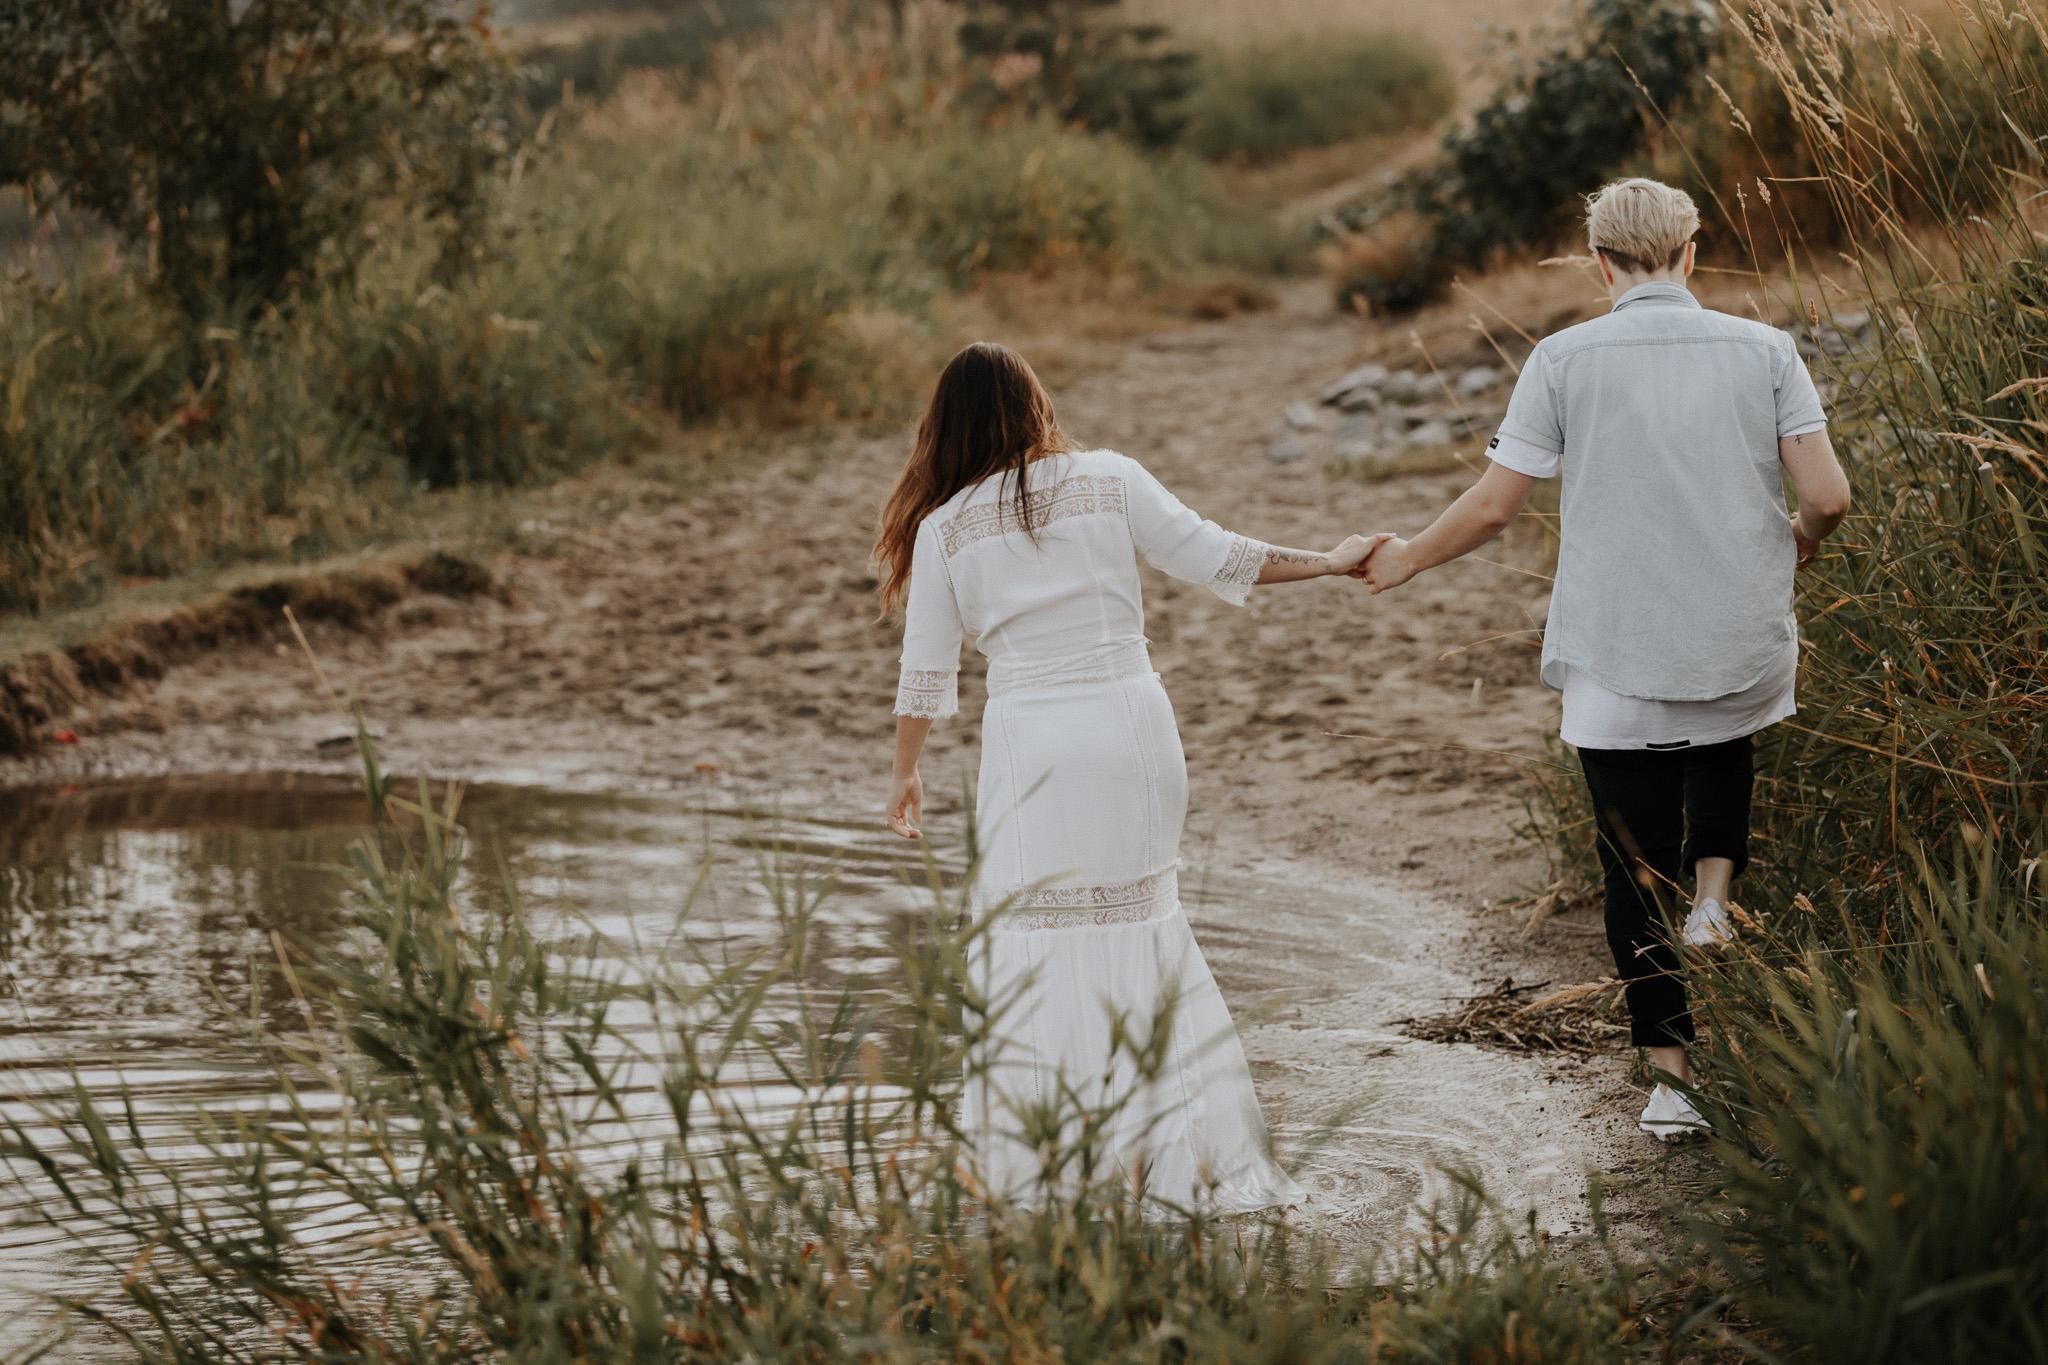 vancouver wedding photographer - lifestyle engagement session-9.jpg